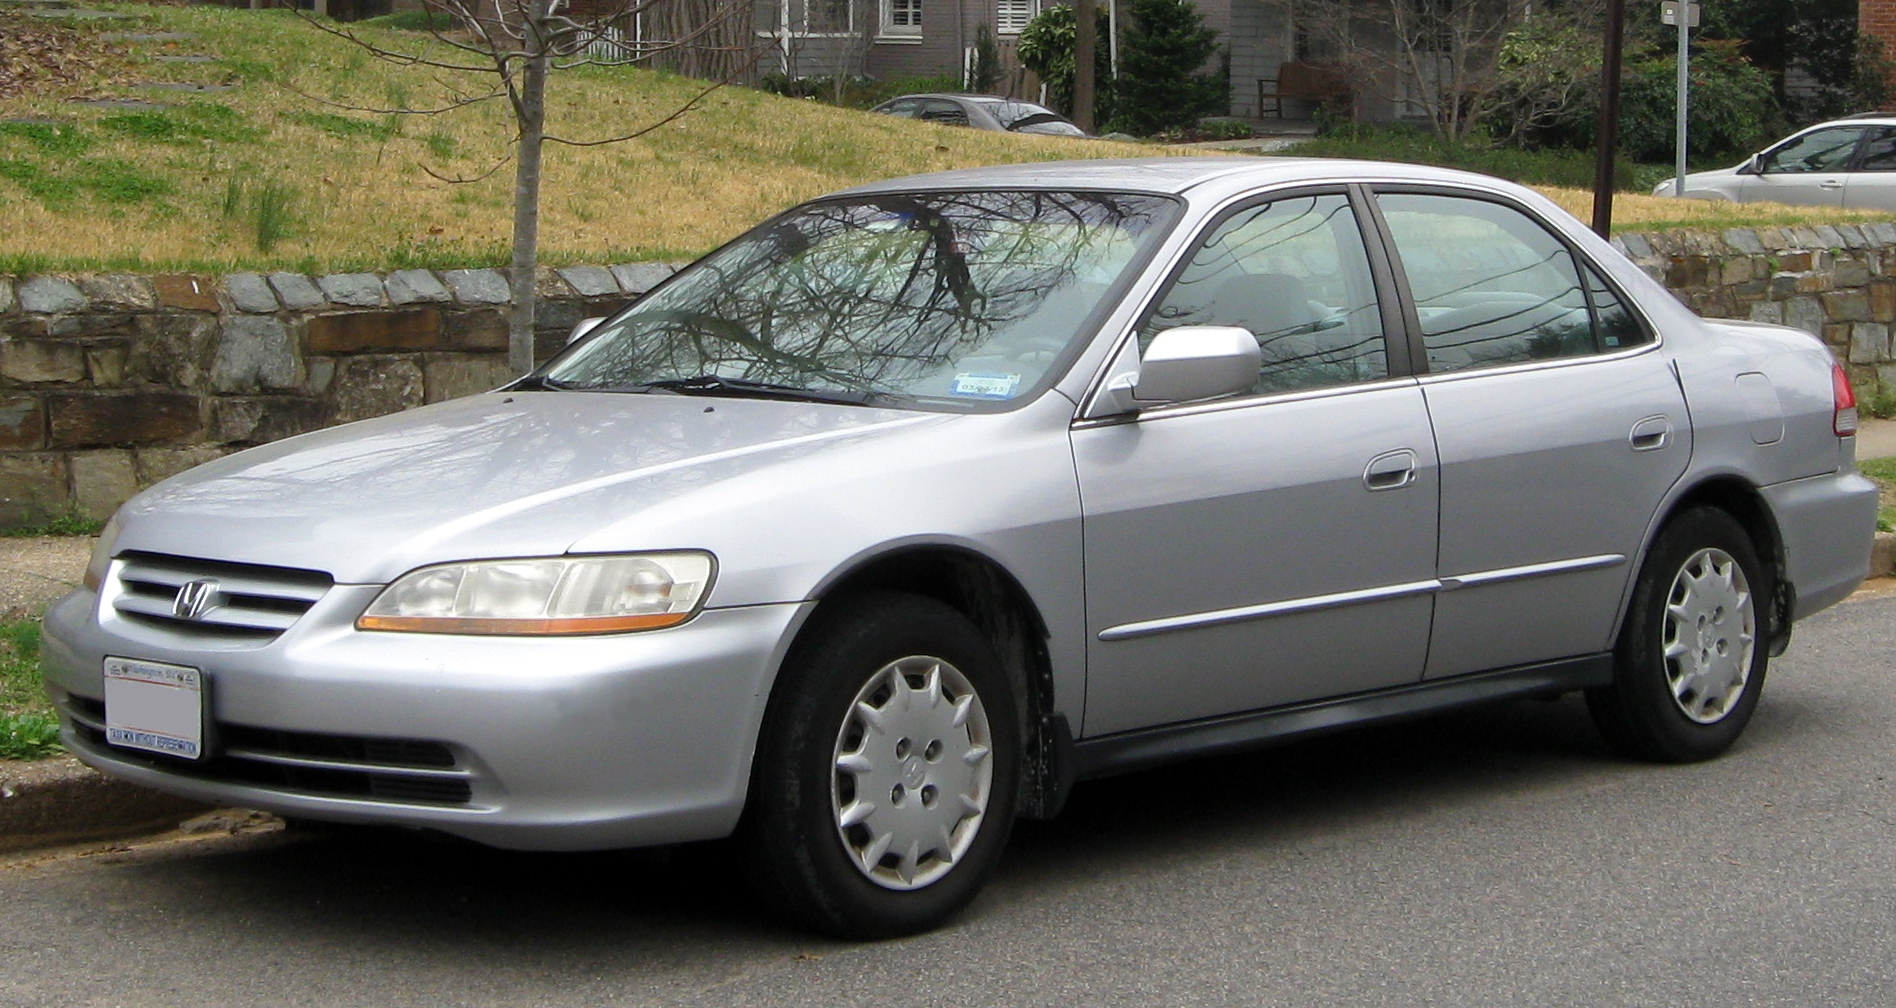 Description 2001-2002 Honda Accord sedan -- 03-16-2012.JPG